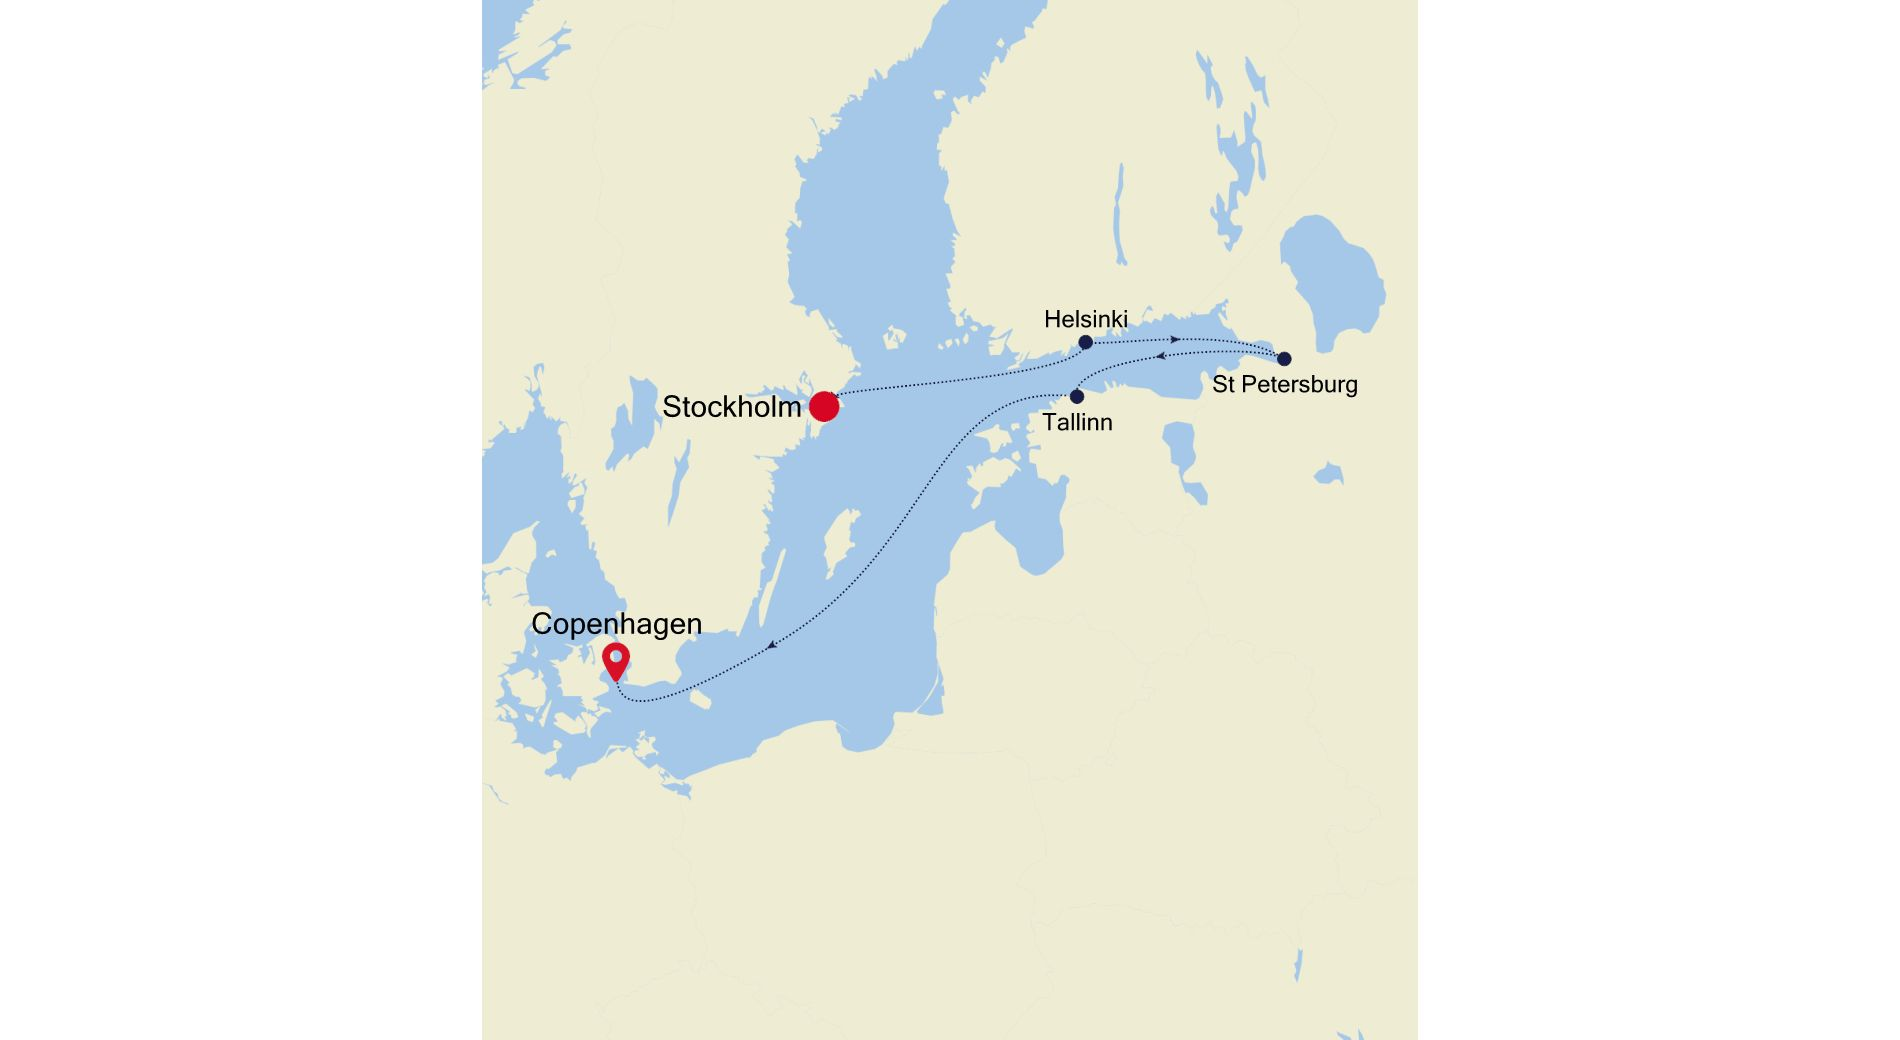 5919 - Stockholm to Copenhagen